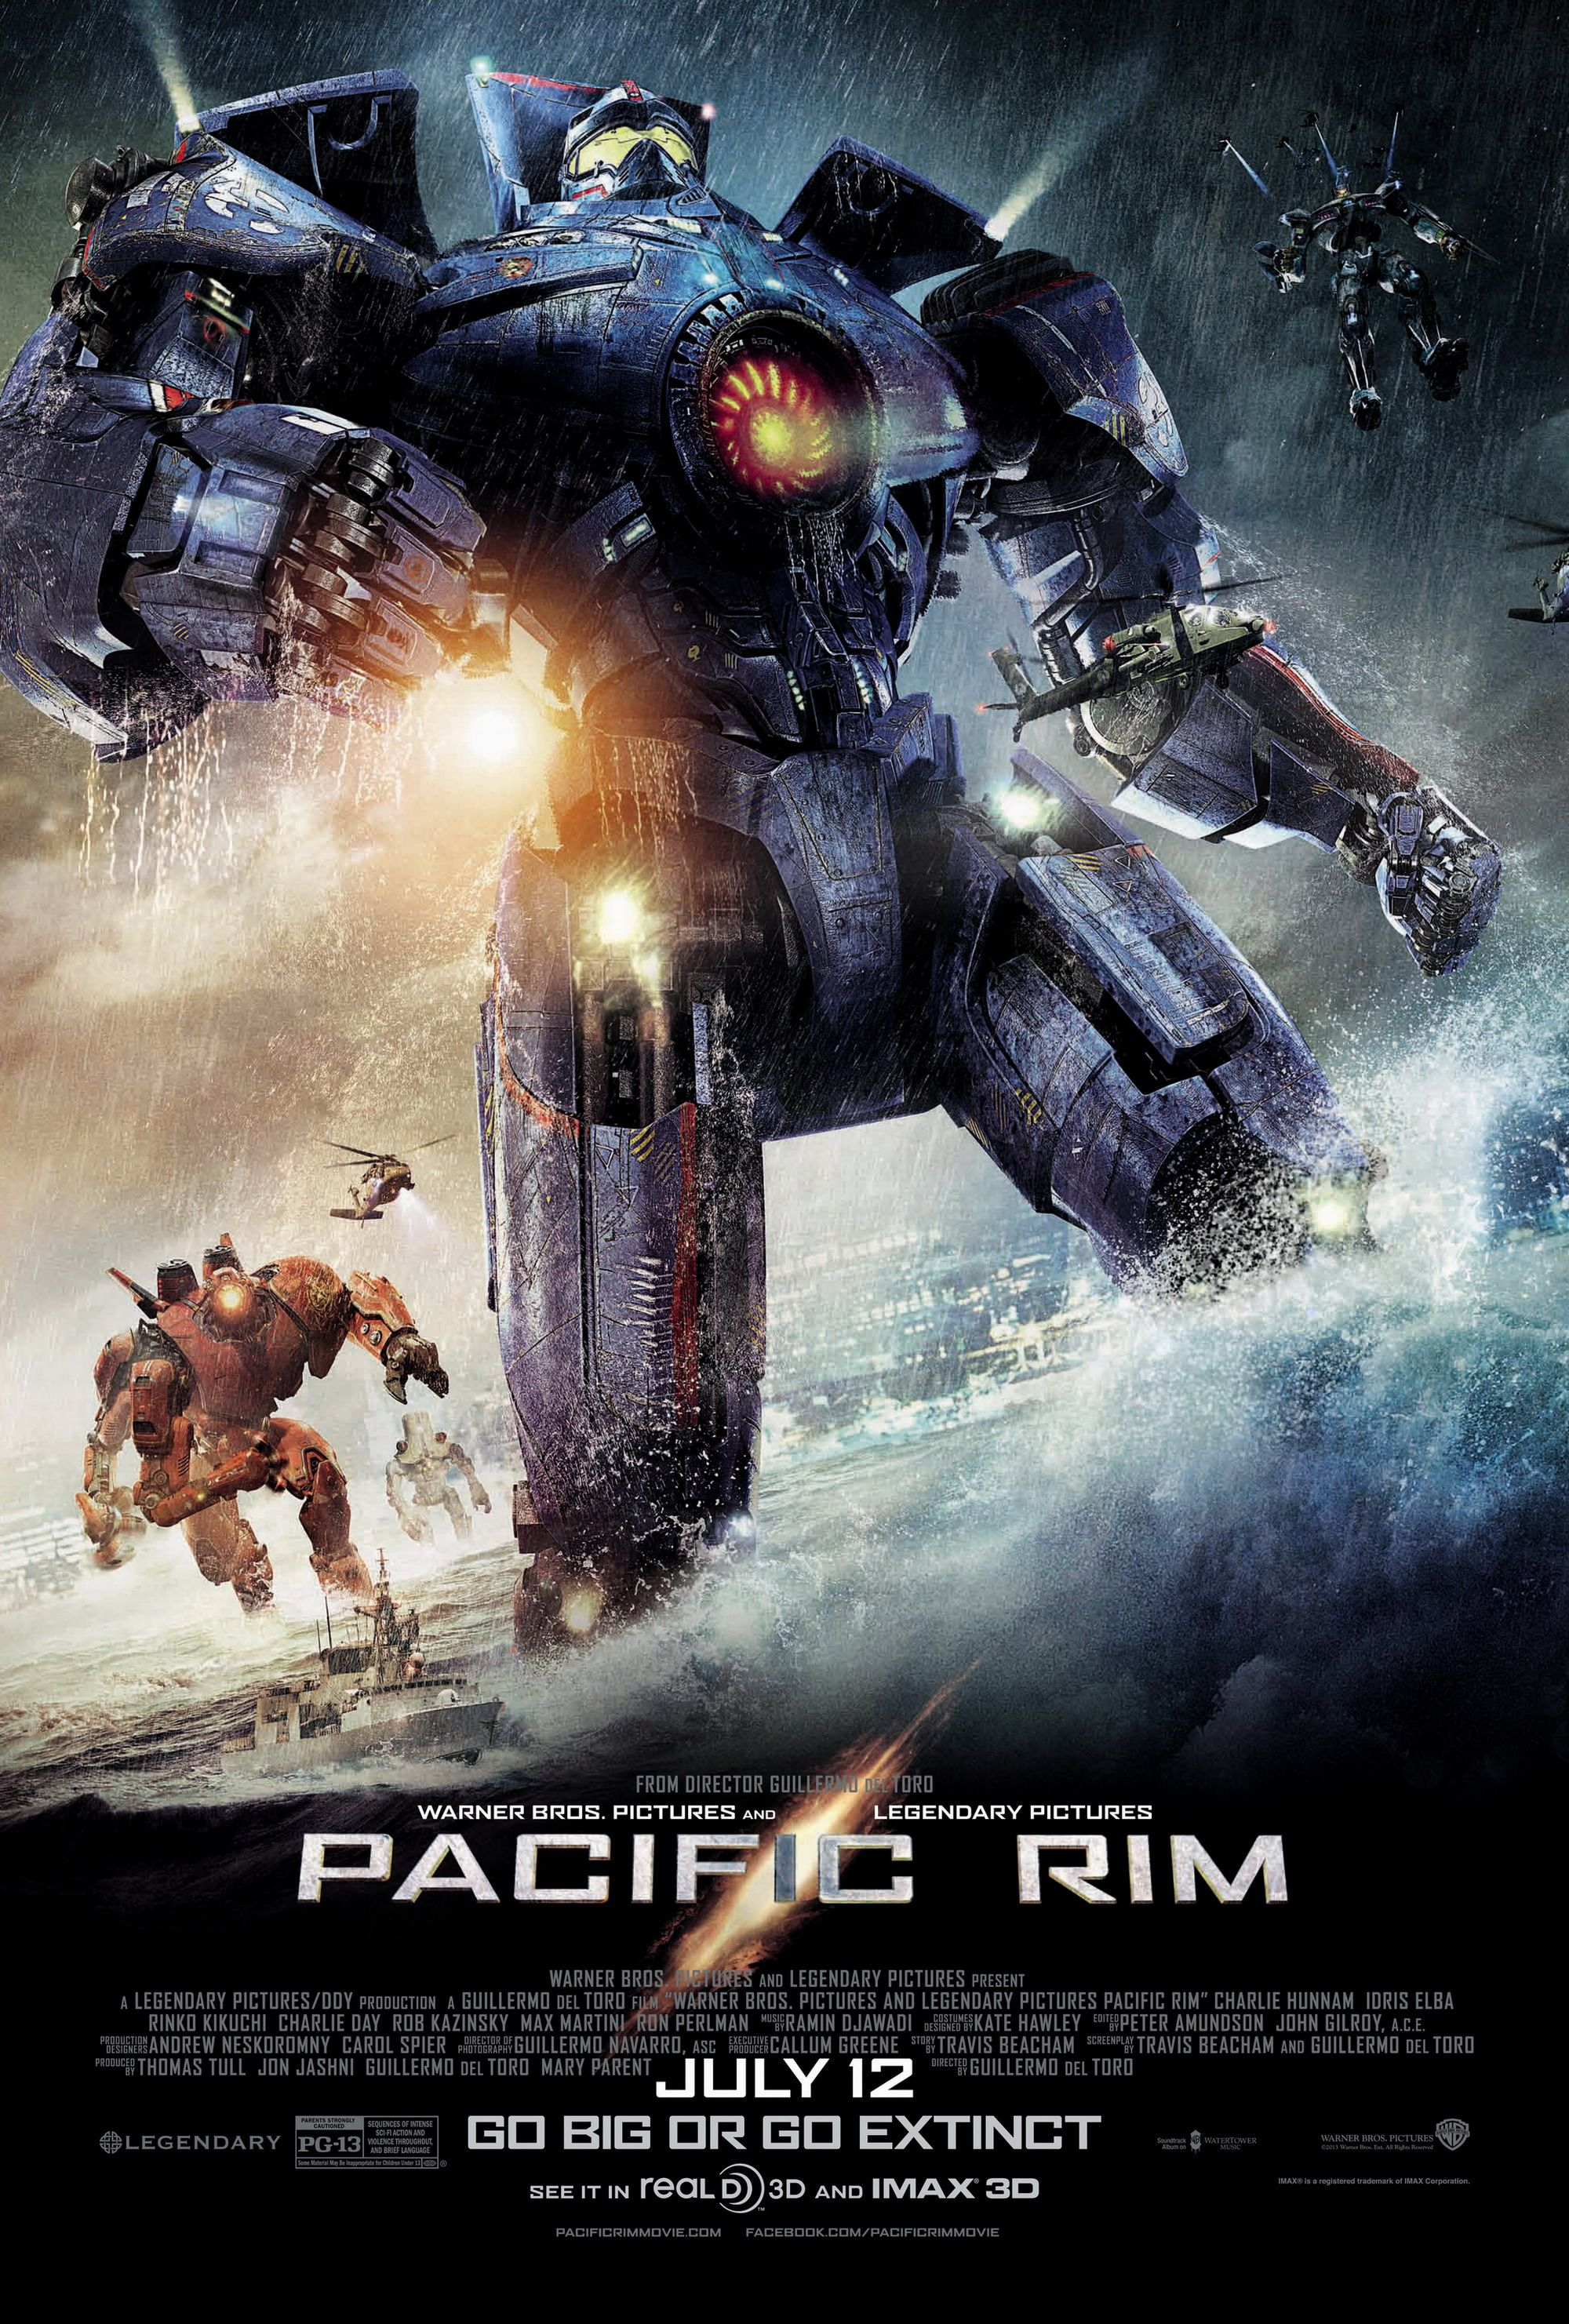 Pin De Yu Hsuan Lin En Tv Books Movies And Music Pelicula Titanes Del Pacifico Titanes Del Pacifico Afiche De Pelicula